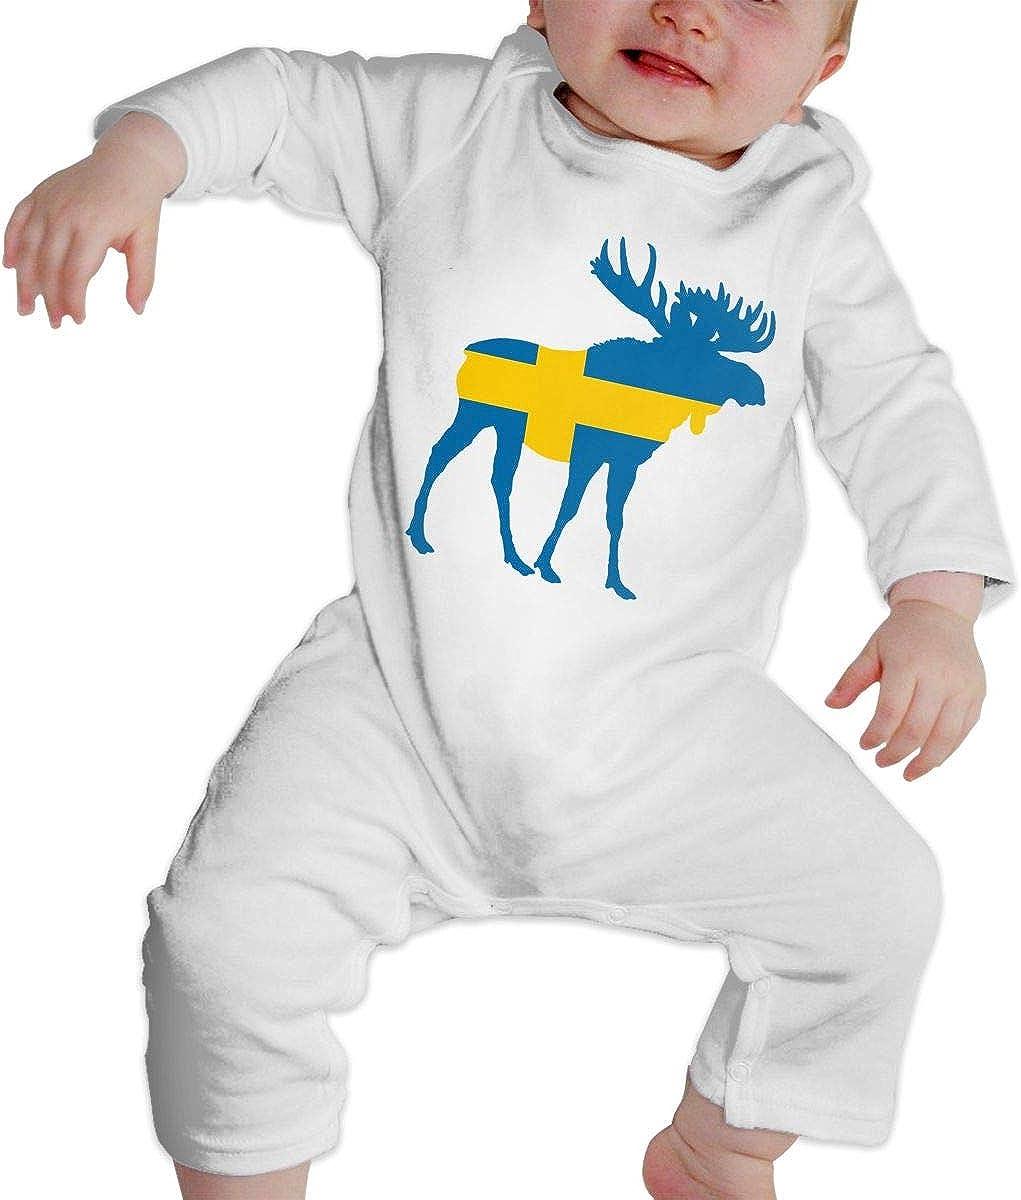 RuimingDe Baby Romper Jumpsuit Swedish Flag Moose Infant Long Sleeve Bodysuit One Piece Outfits